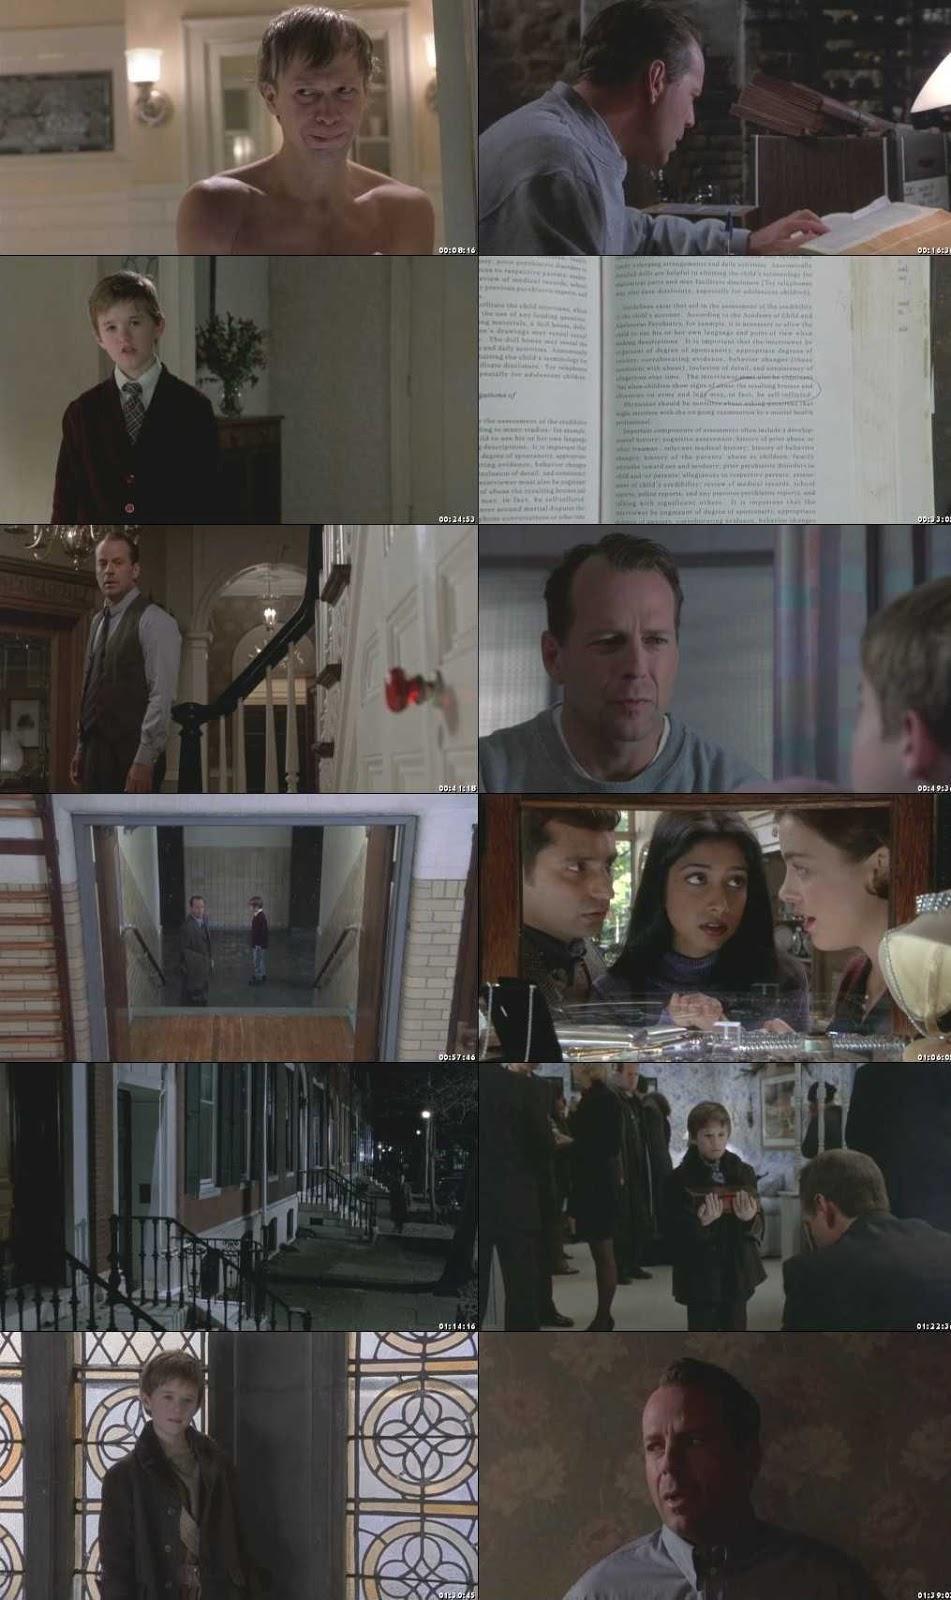 The Sixth Sense 1999 Screenshot